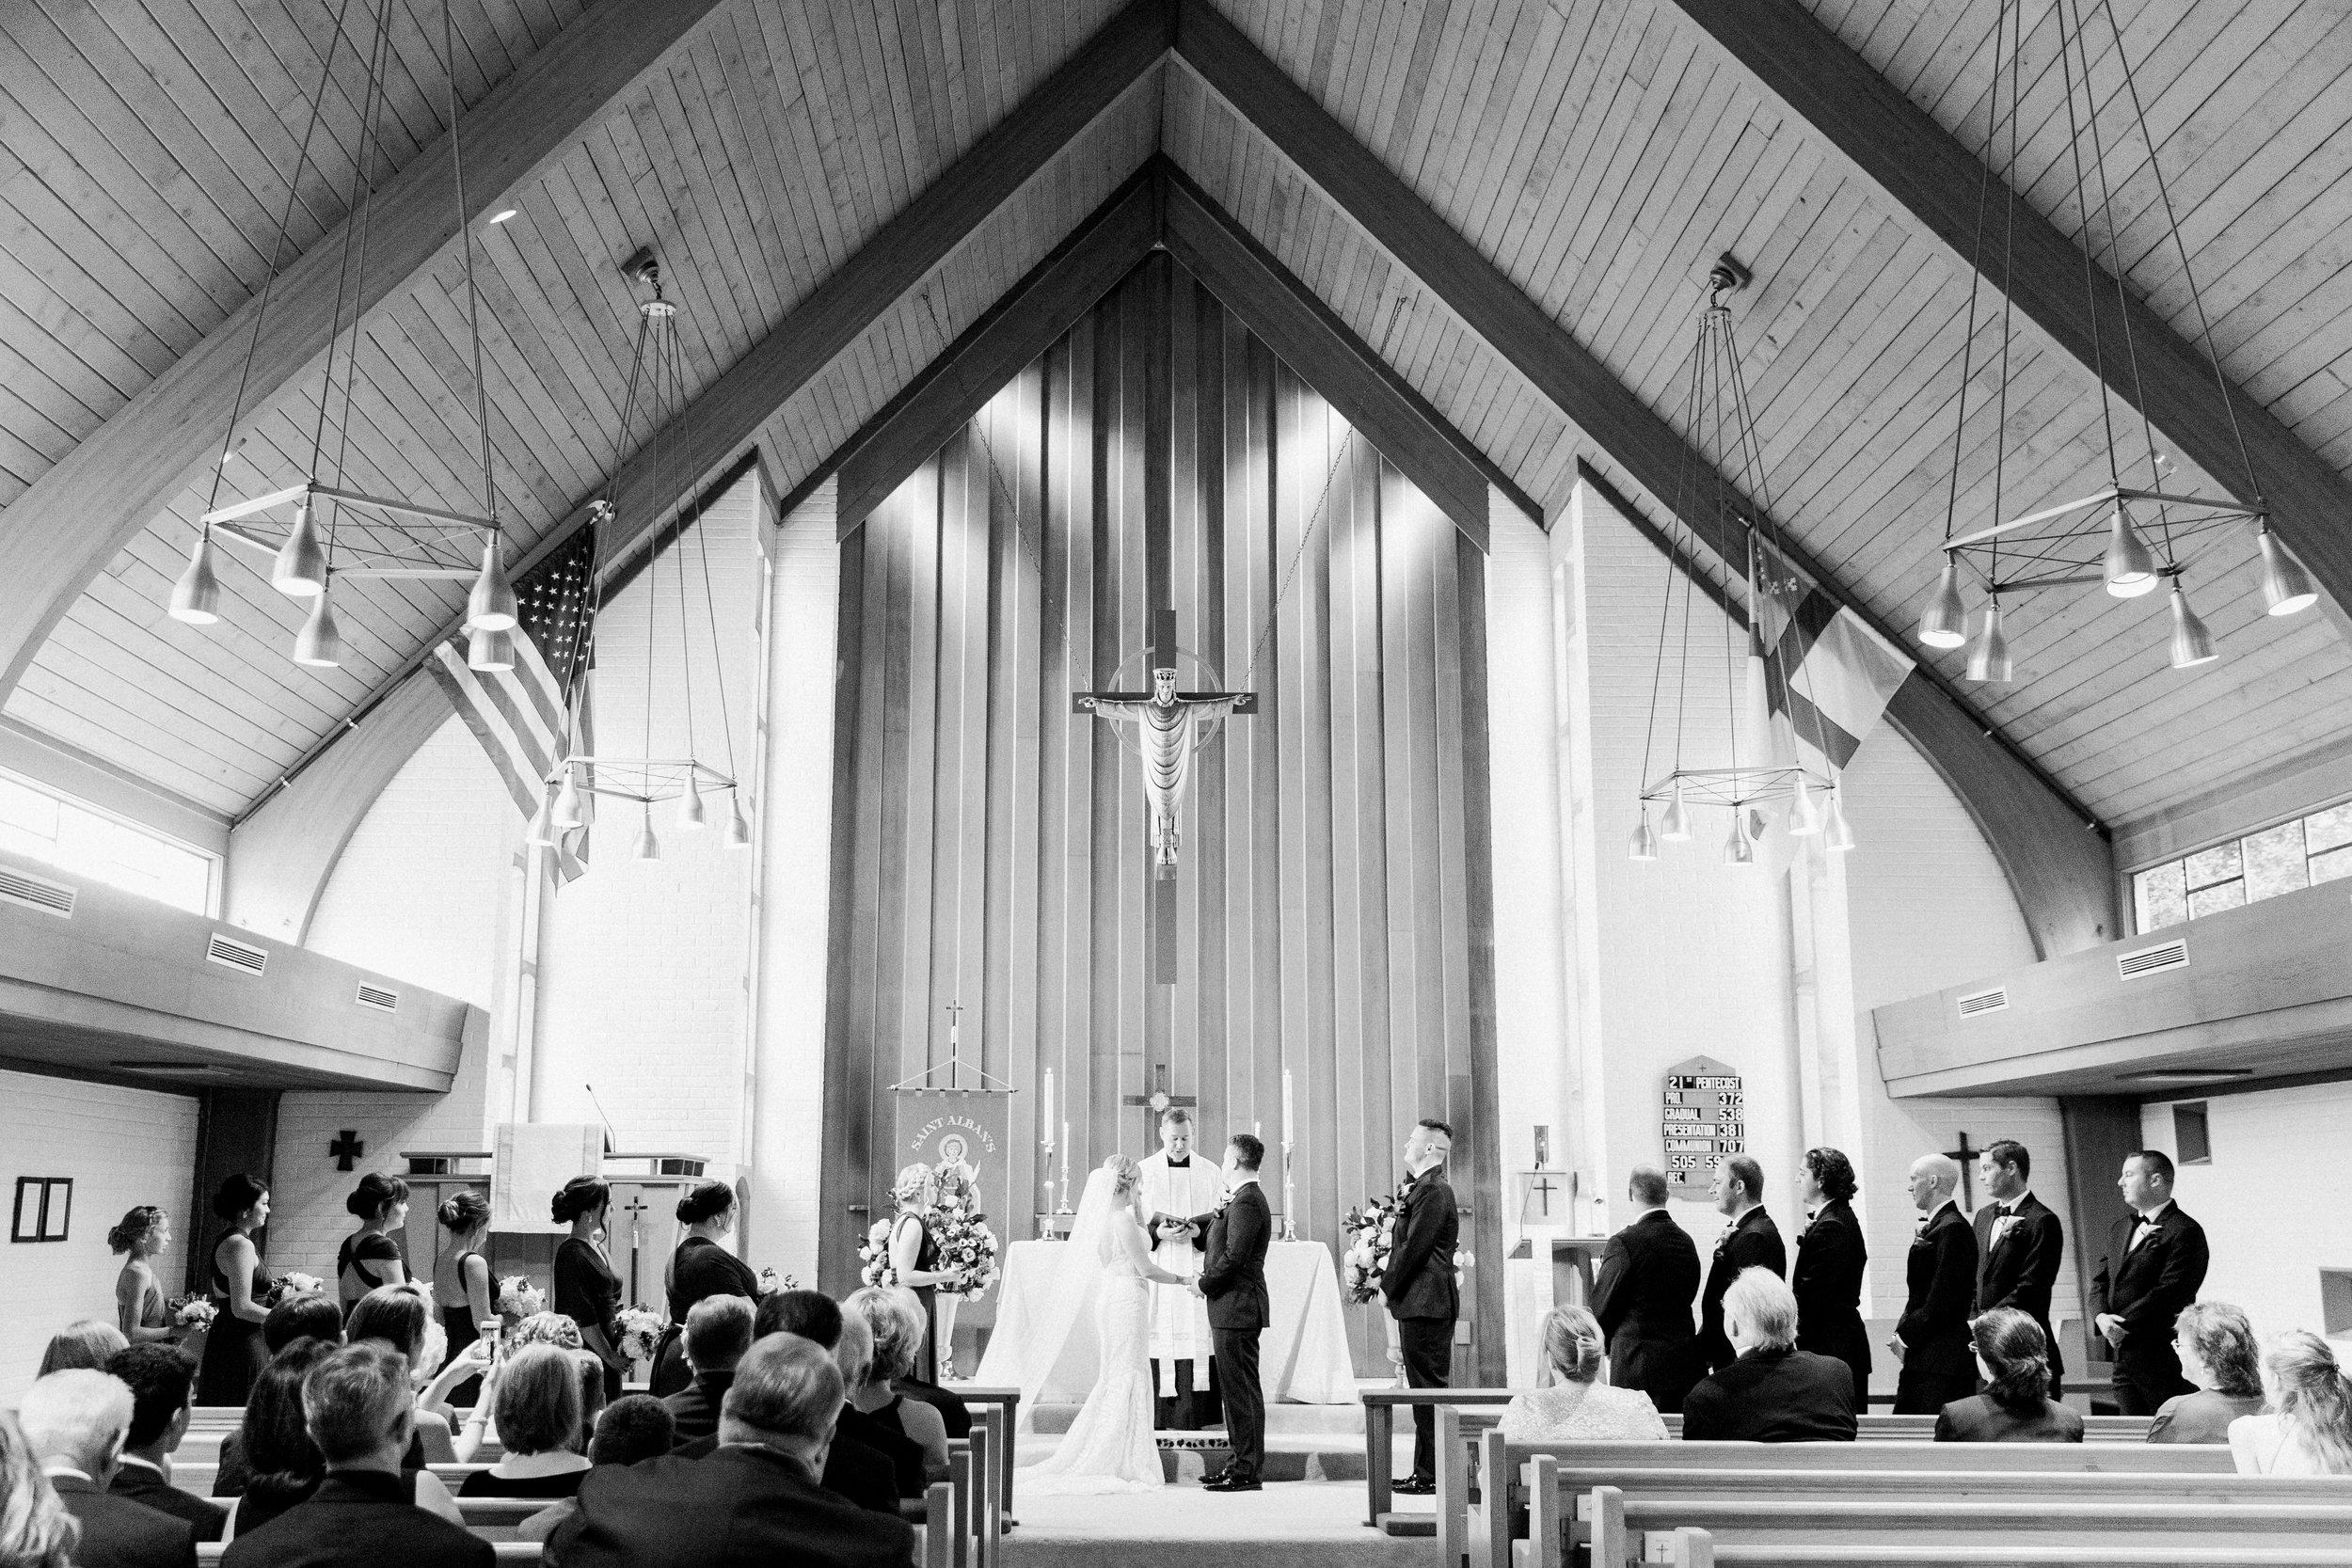 DavidAmandaMundy-Wedding-10282017-KathrynIvyPhotography-207.jpg